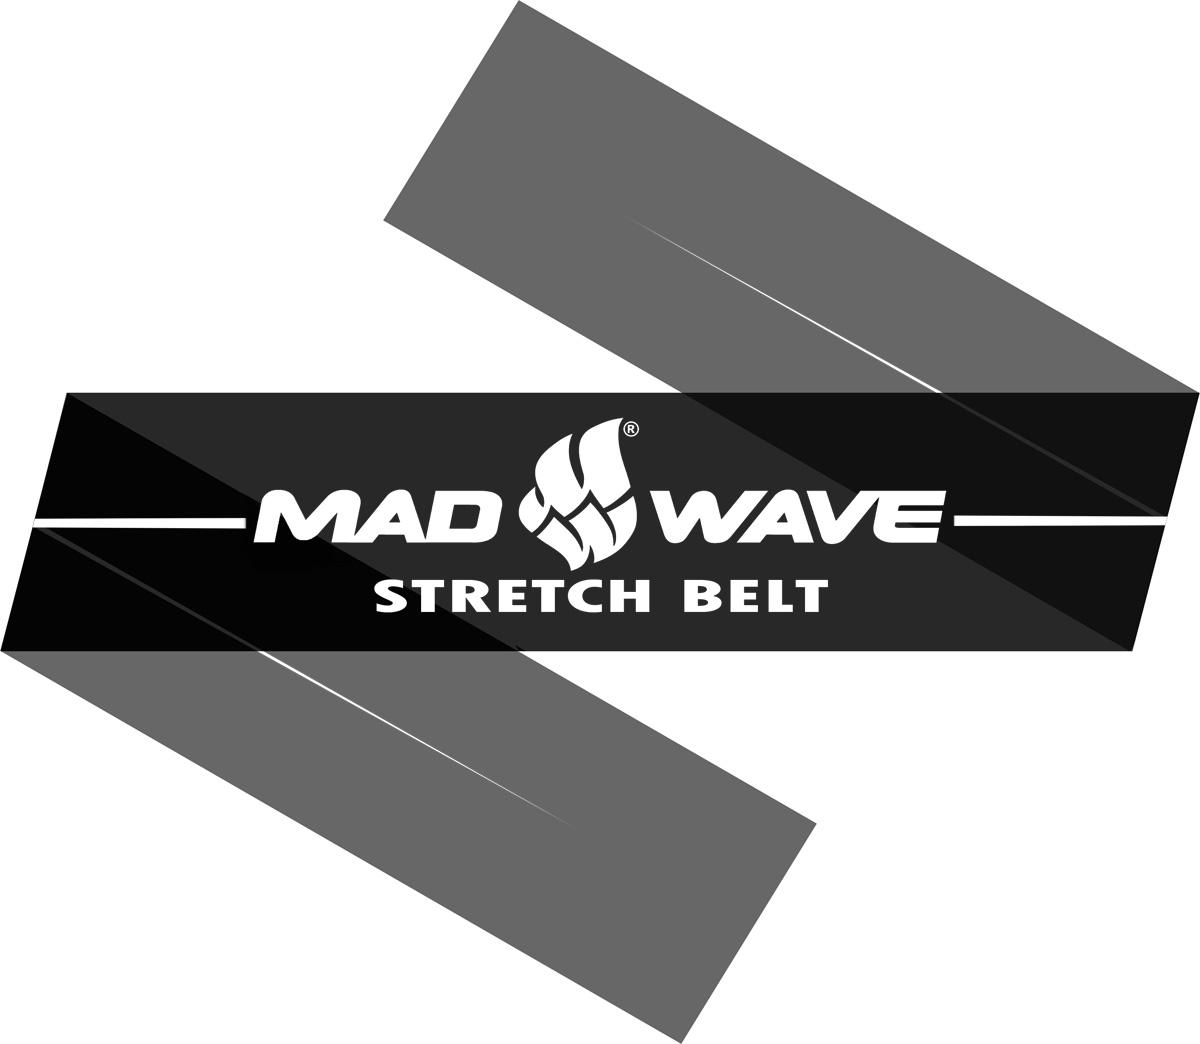 Эспандер Mad Wave Stretch Band, цвет: черный, 150 см х 15 см х 0,04 см